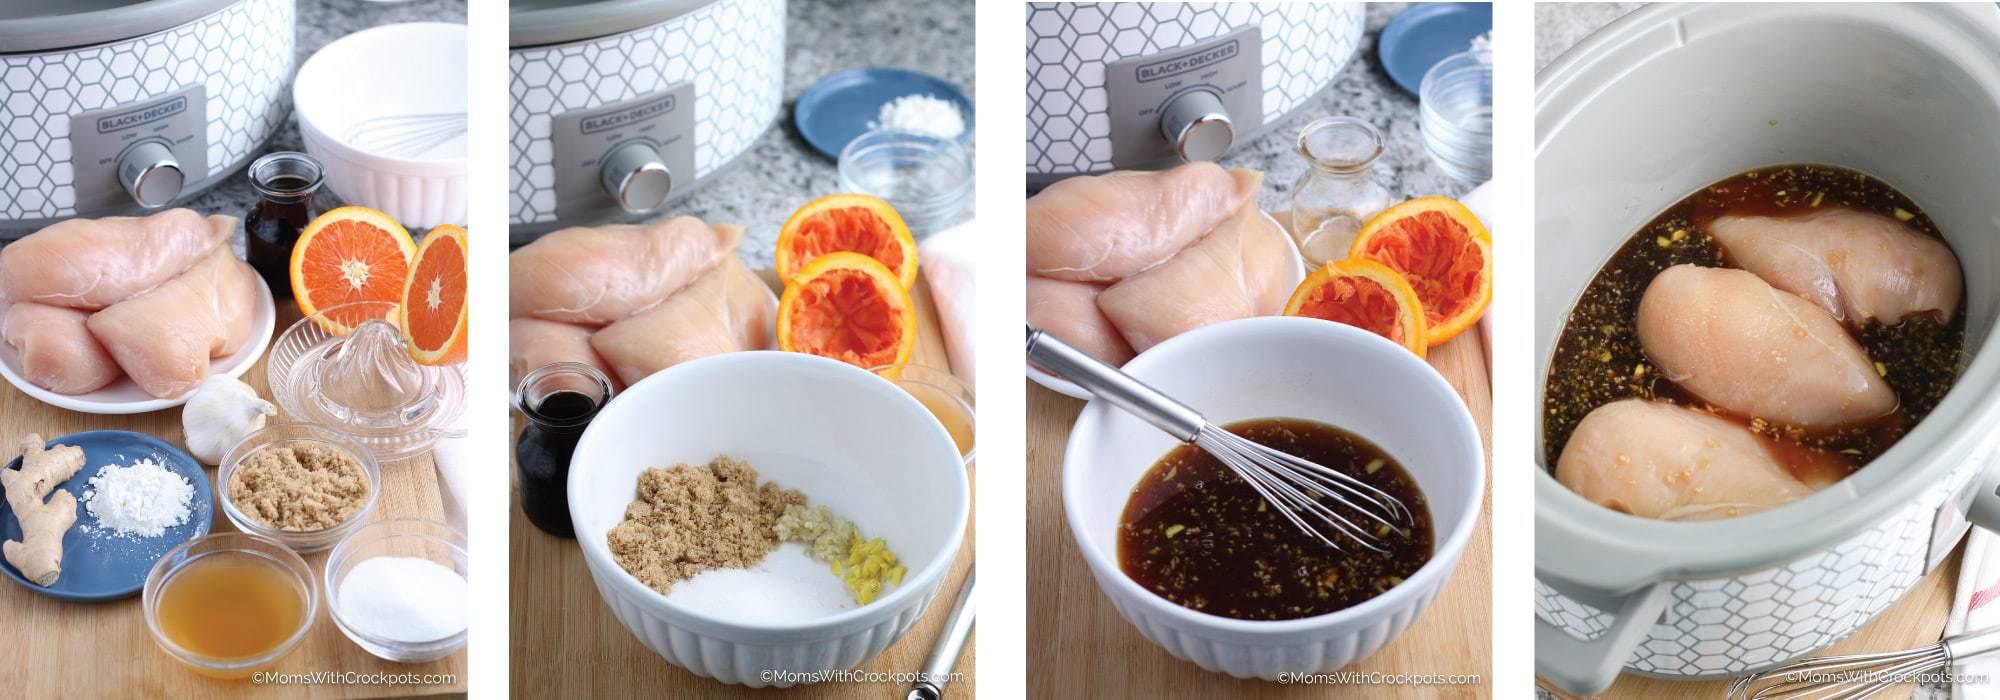 Crock Pot Teriyaki Chicken Steps